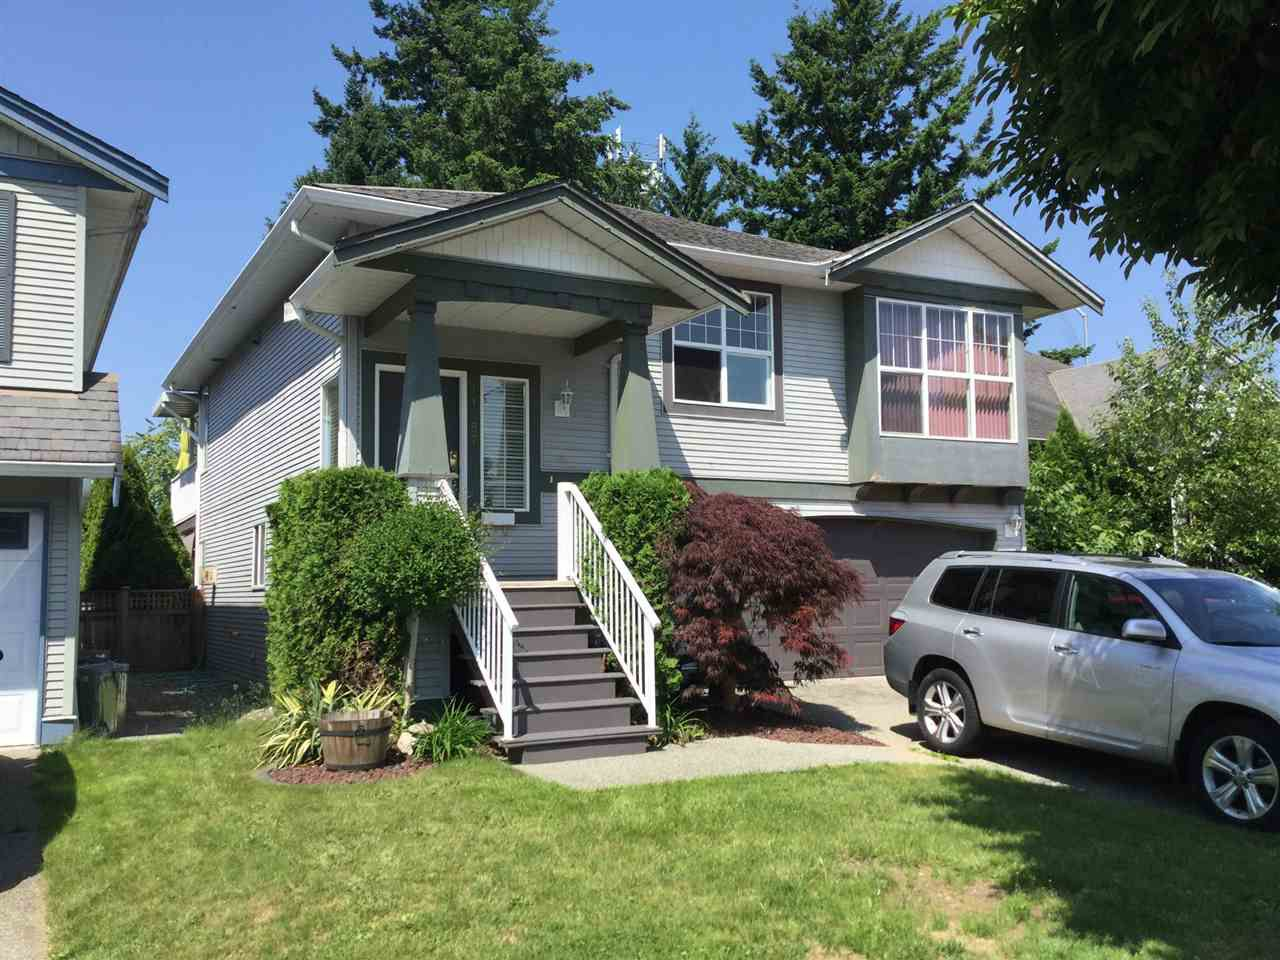 Main Photo: 11487 DARTFORD Street in Maple Ridge: Southwest Maple Ridge House for sale : MLS®# R2374877